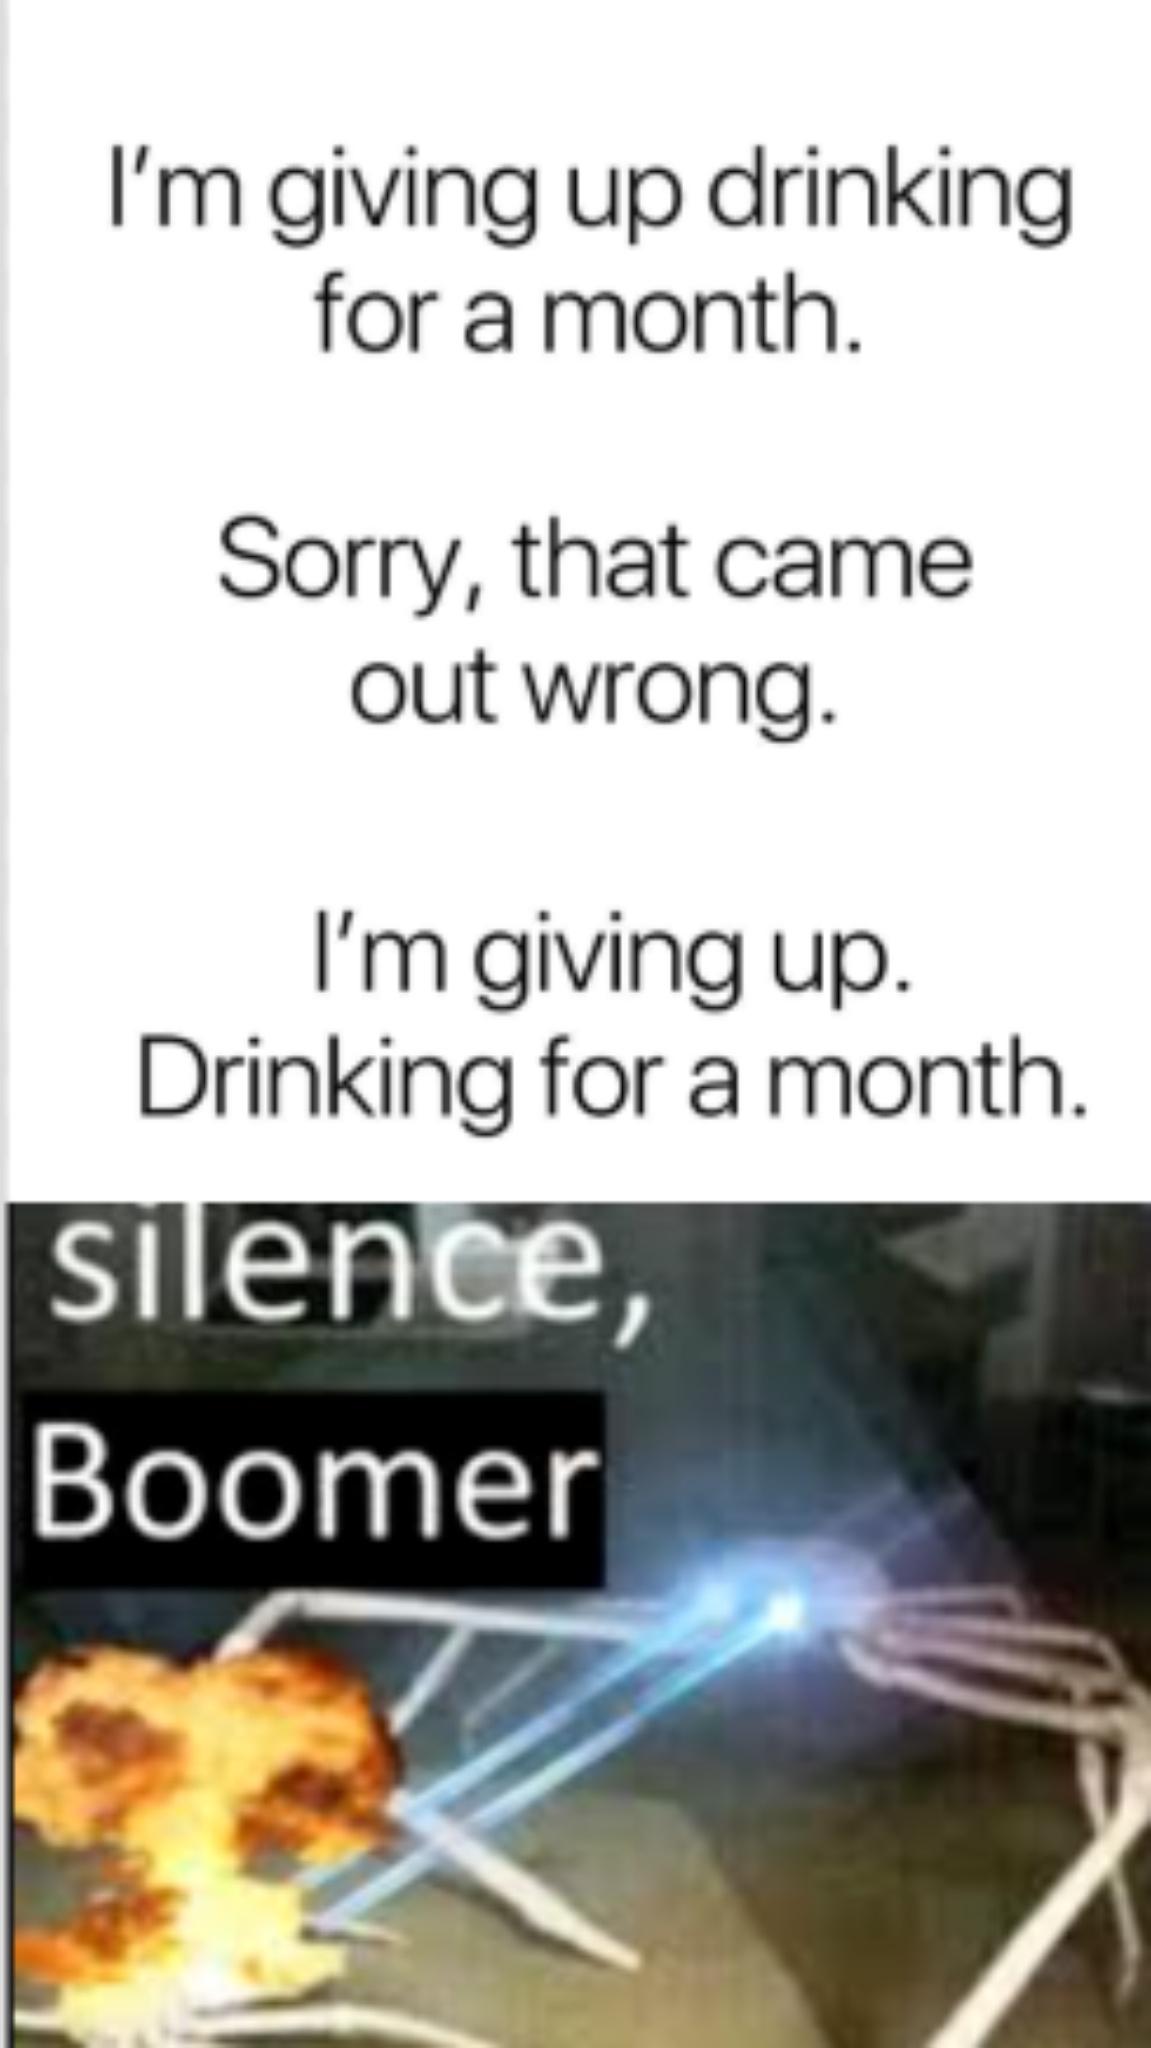 boomer - meme